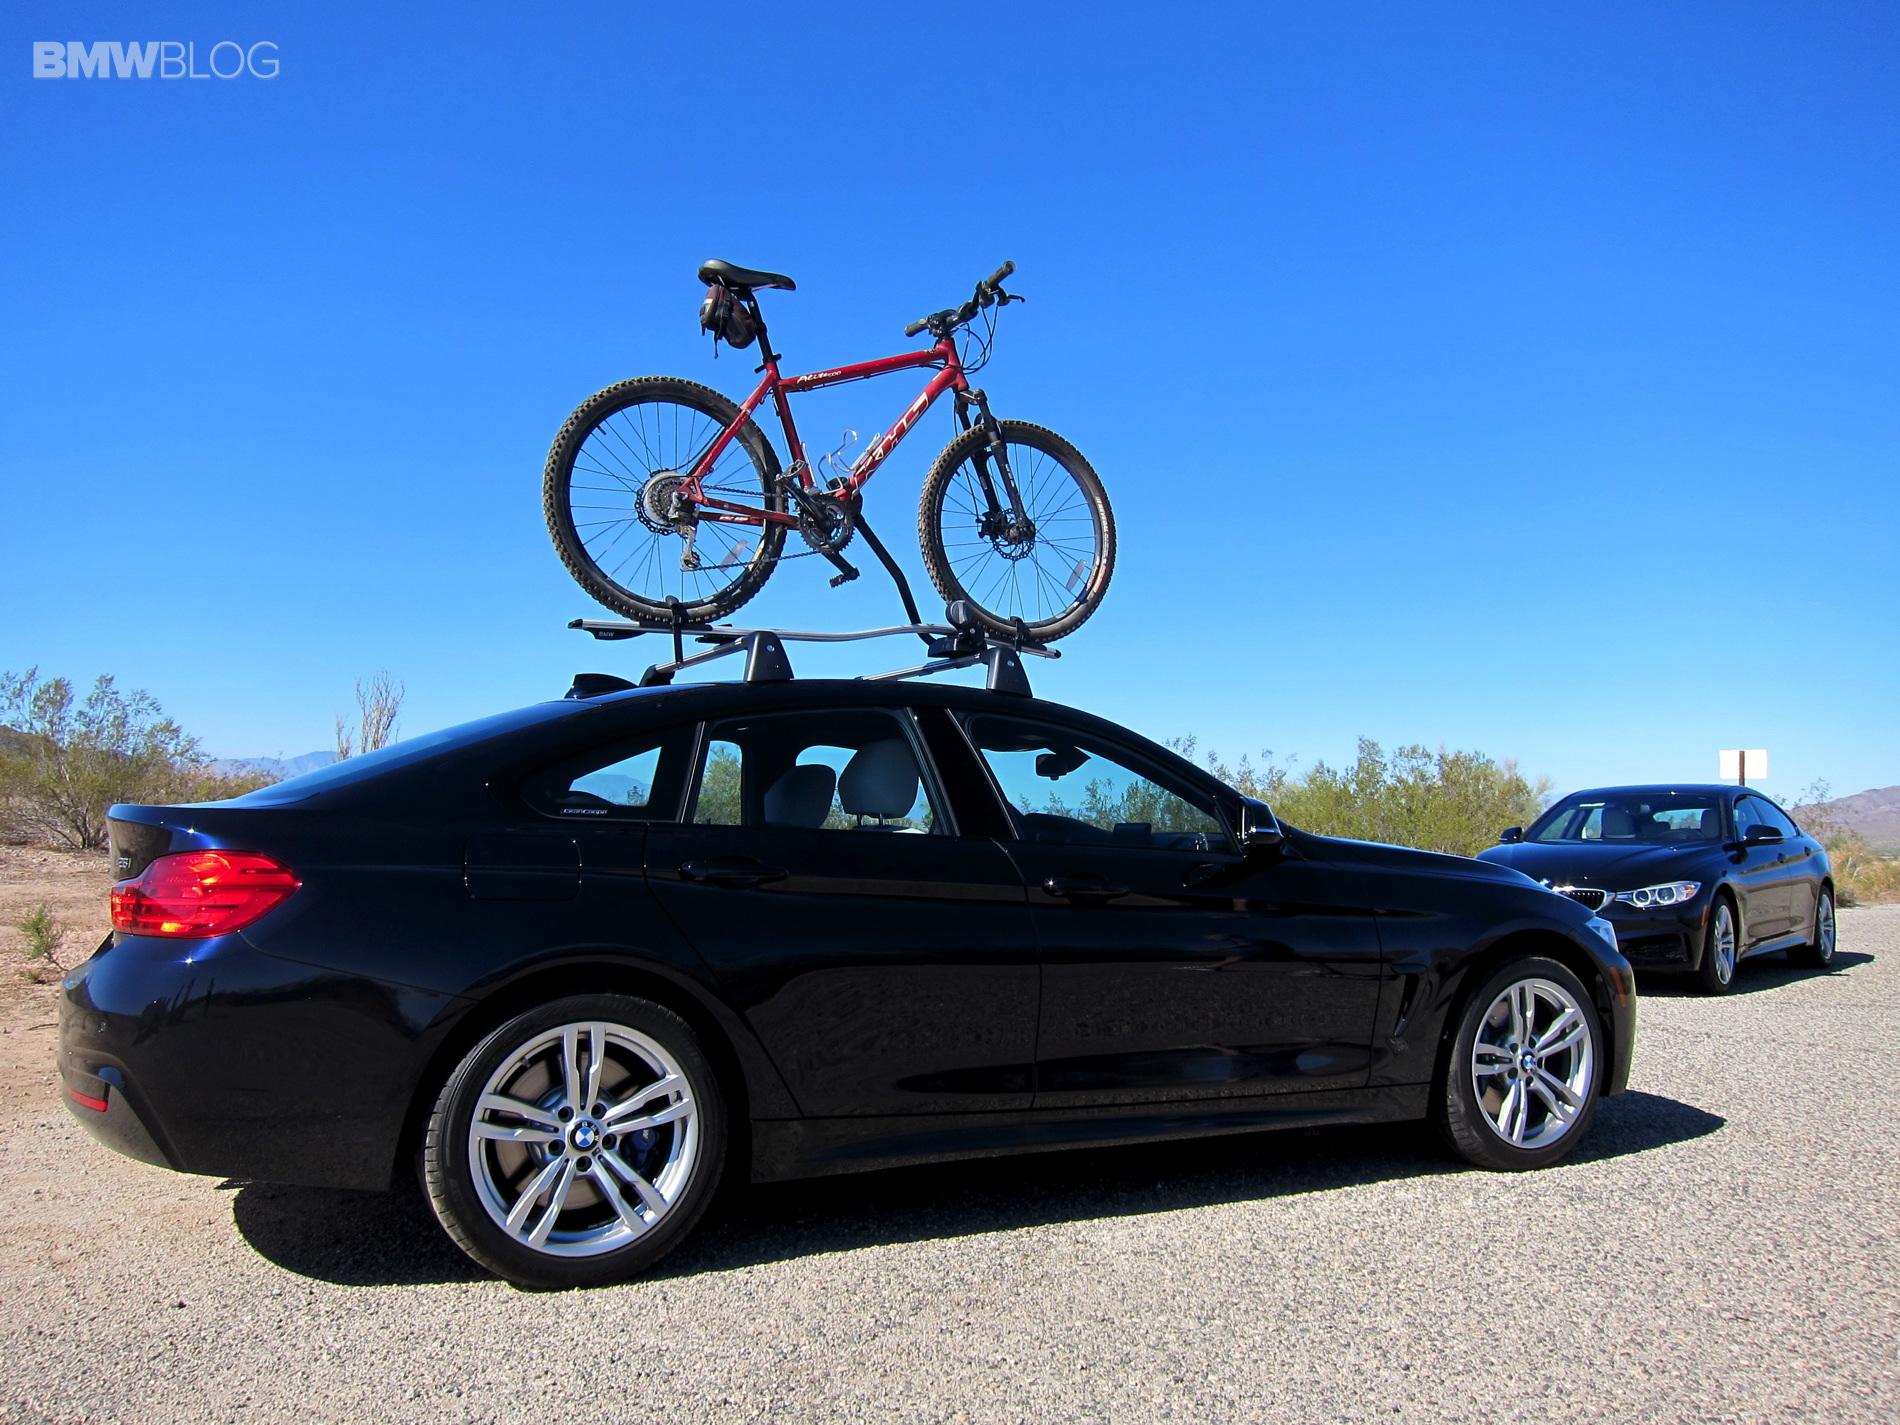 BMWBLOG Test Drive: 2014 BMW 4 Series Gran Coupe